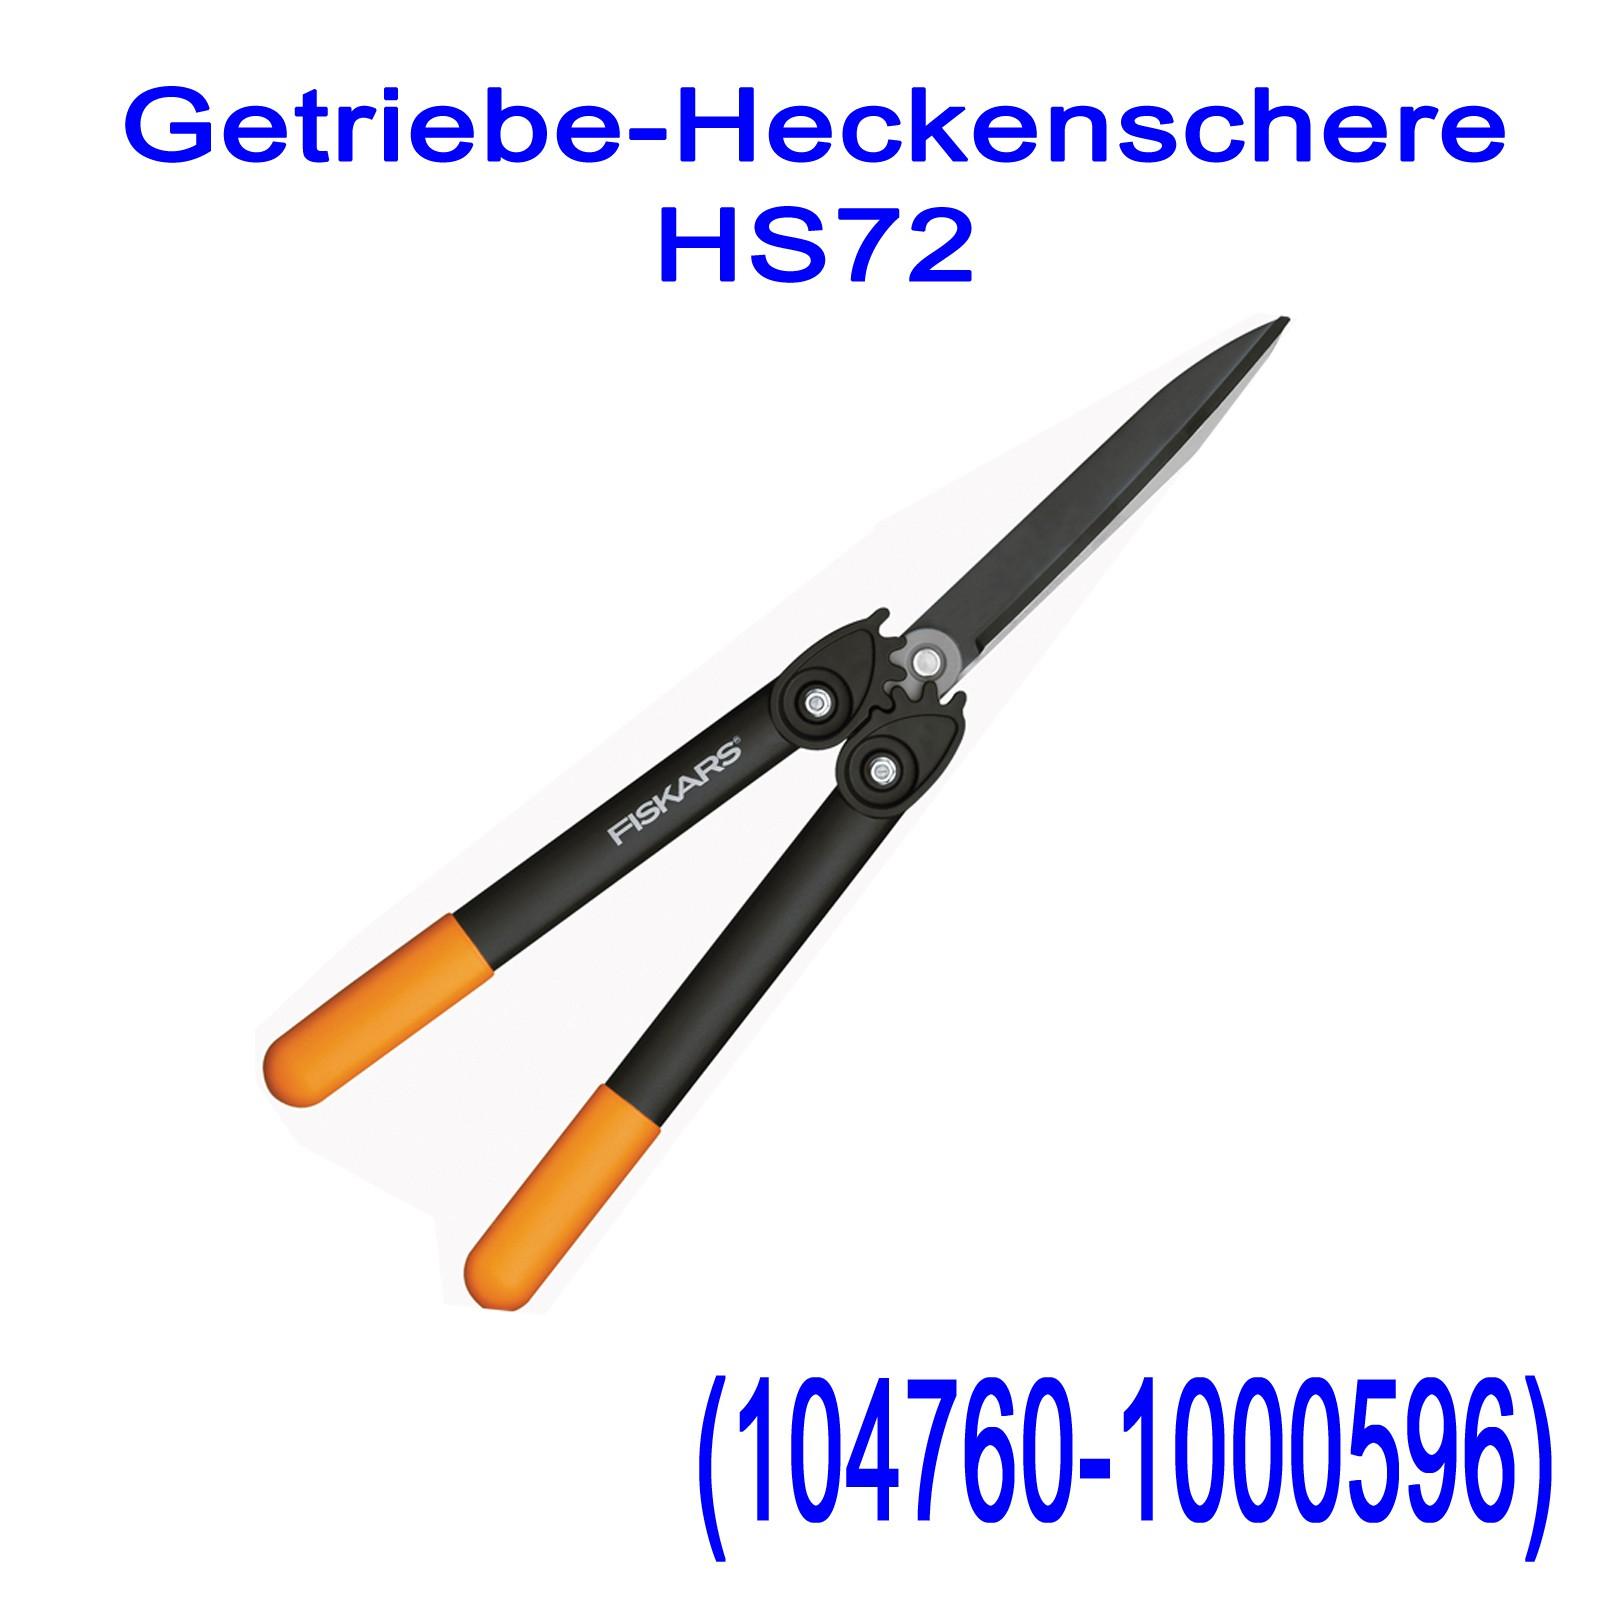 Fiskars Heckenscheren PowerGear SmartFit HS72 HS86 HS92 Auswahl Strauchscheren var-fisk-heckenscheren